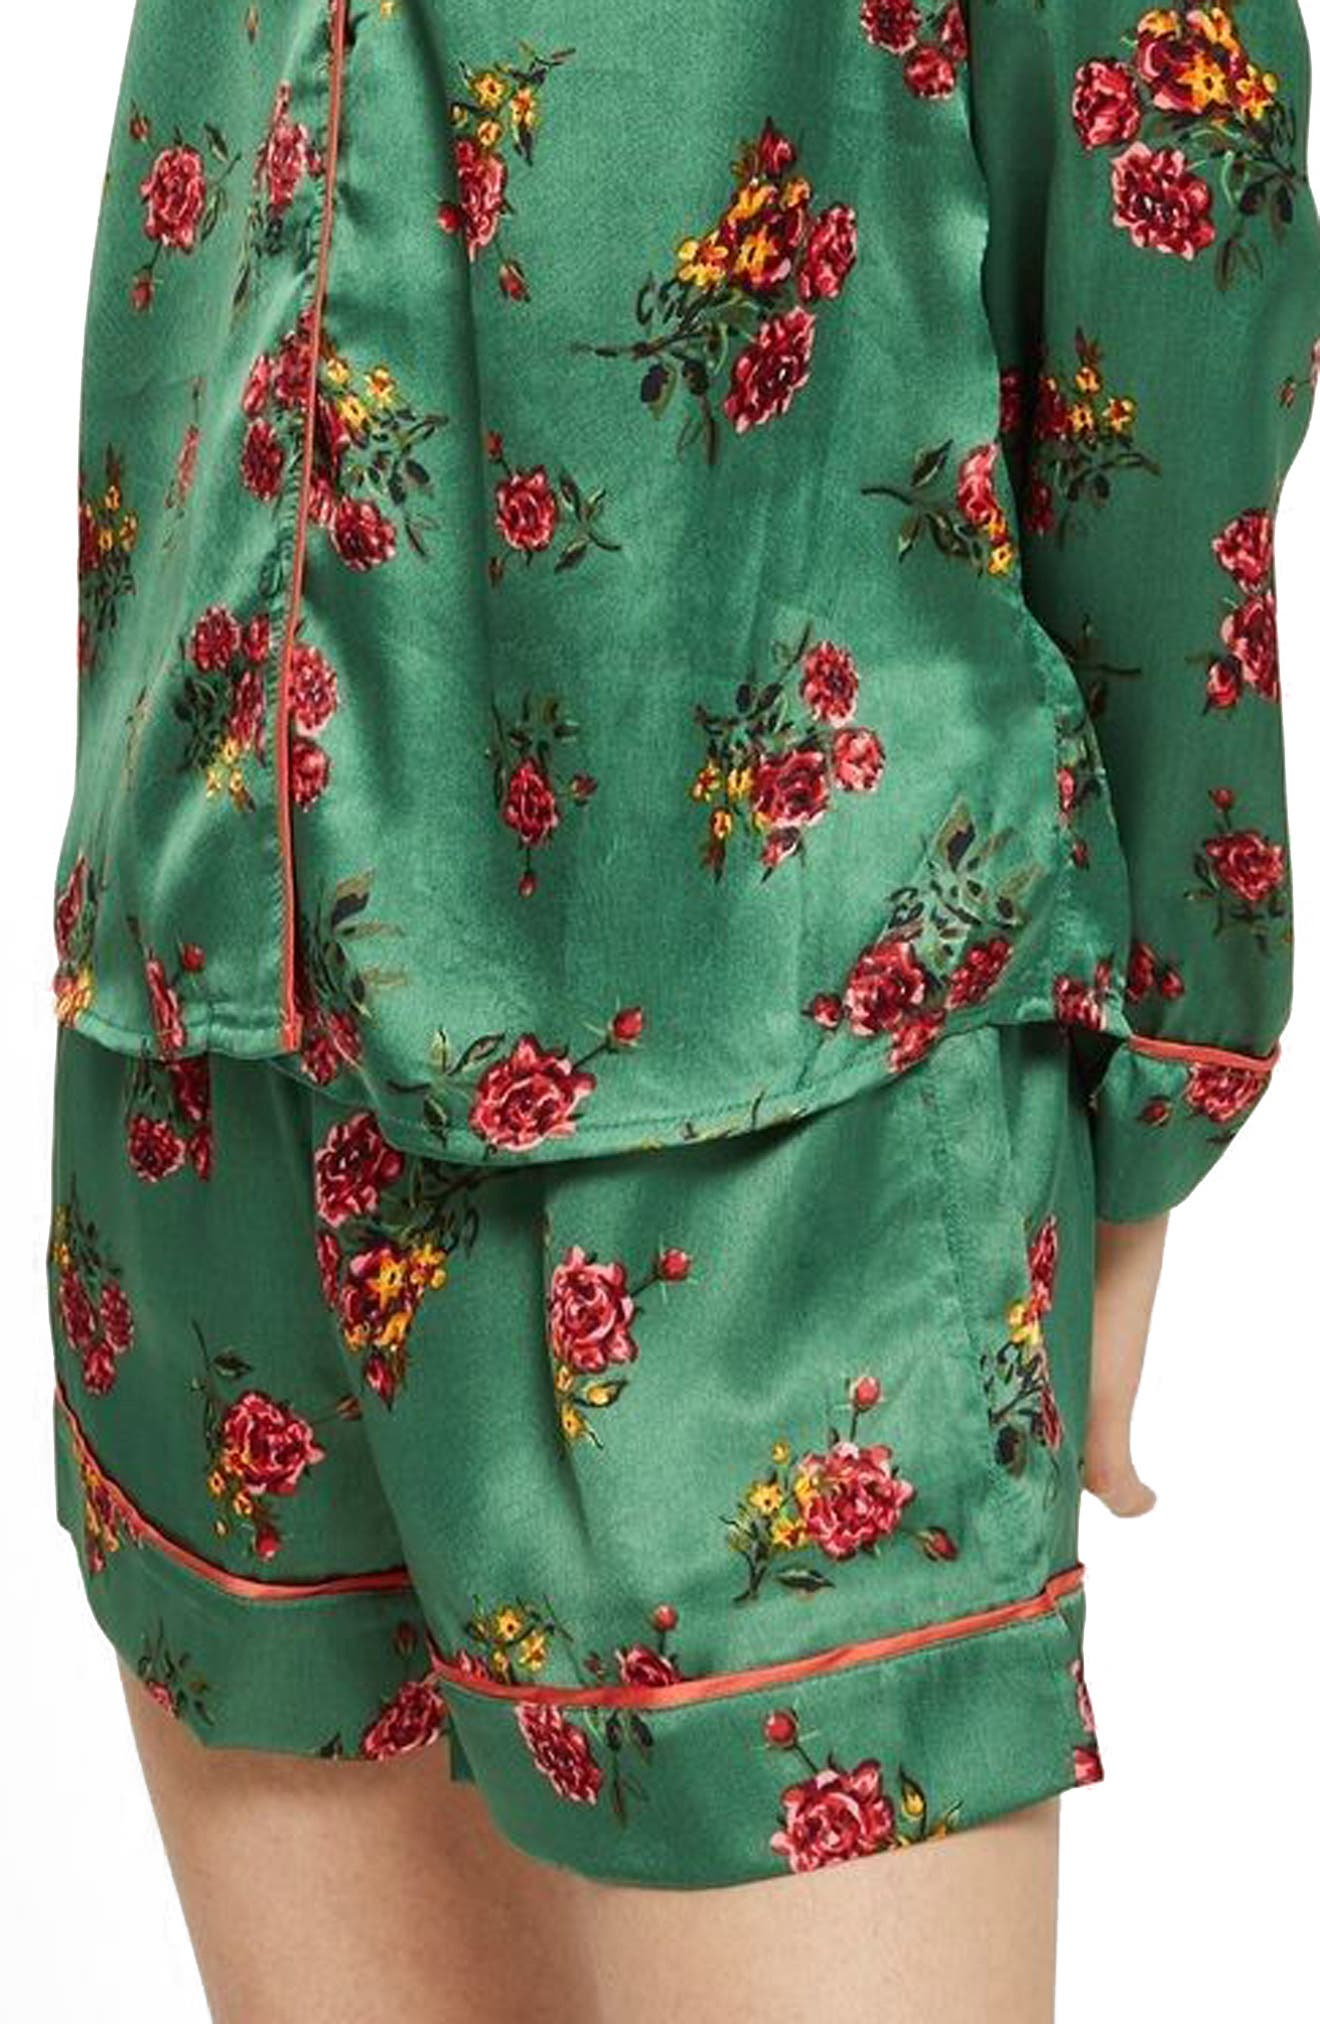 Floral Print Pajama Shorts,                         Main,                         color, Bright Green Multi